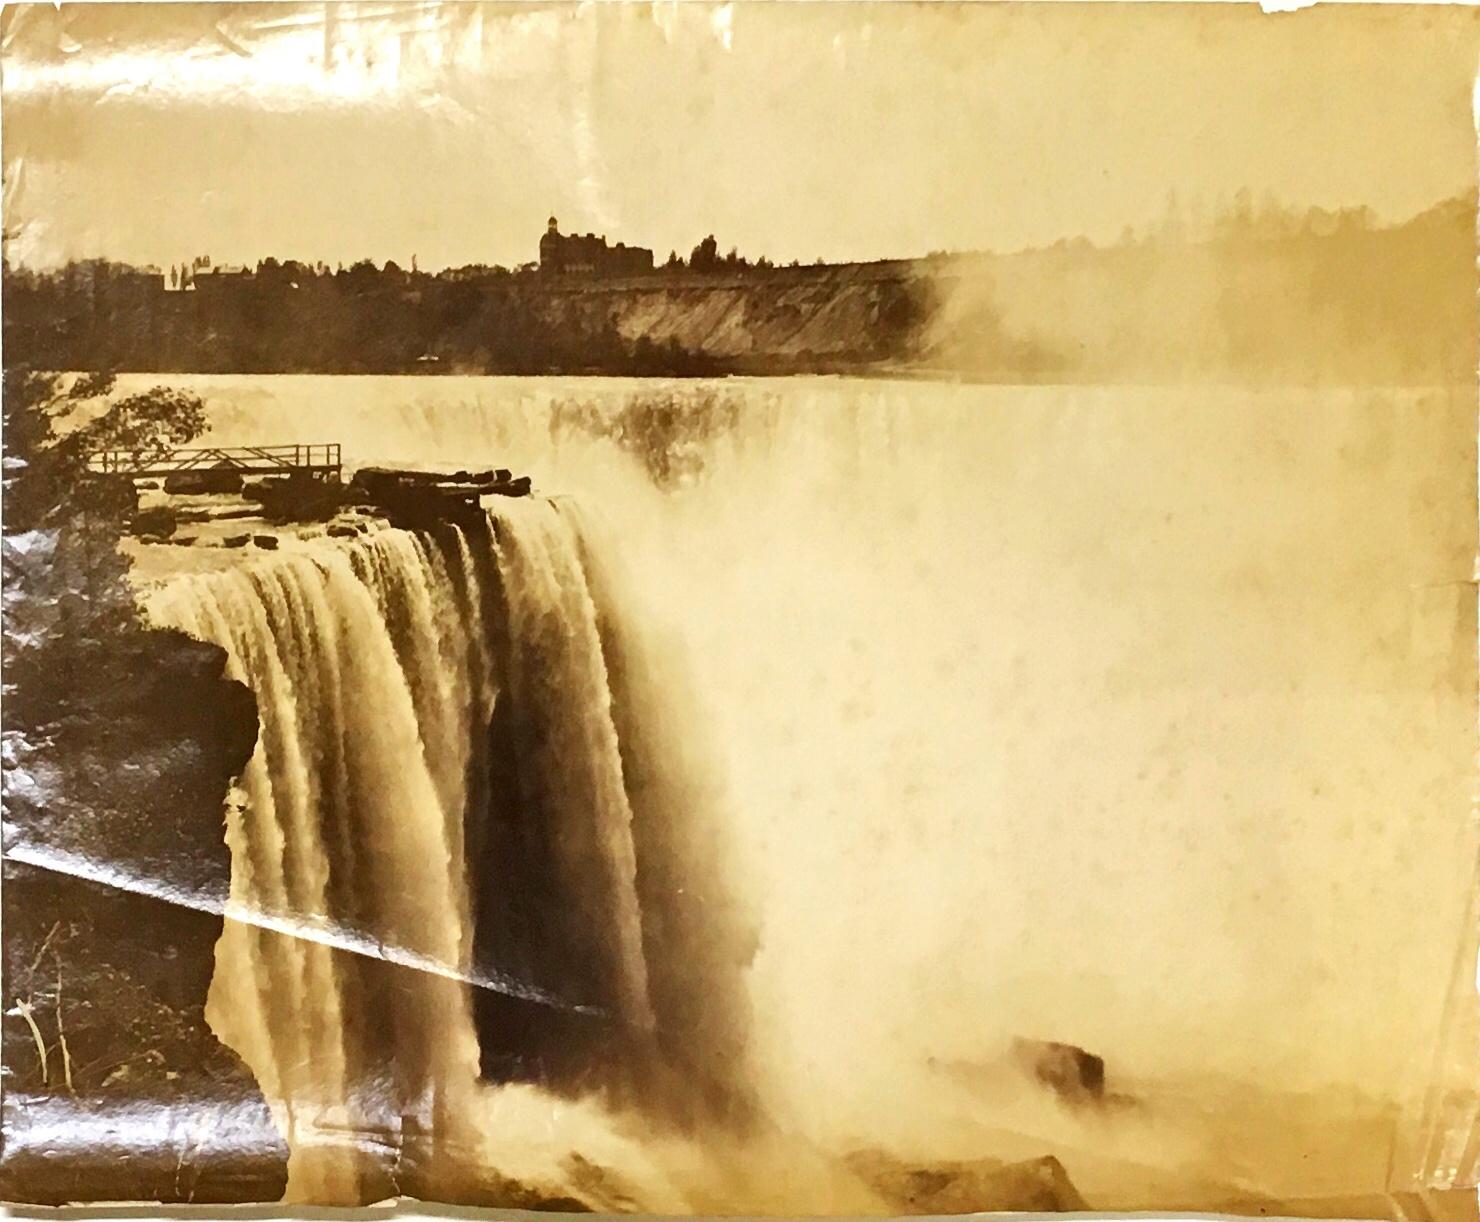 Lot 493 - Rare American Photographs Niagara Falls: Zyback (J.) Photographer, Niagara.